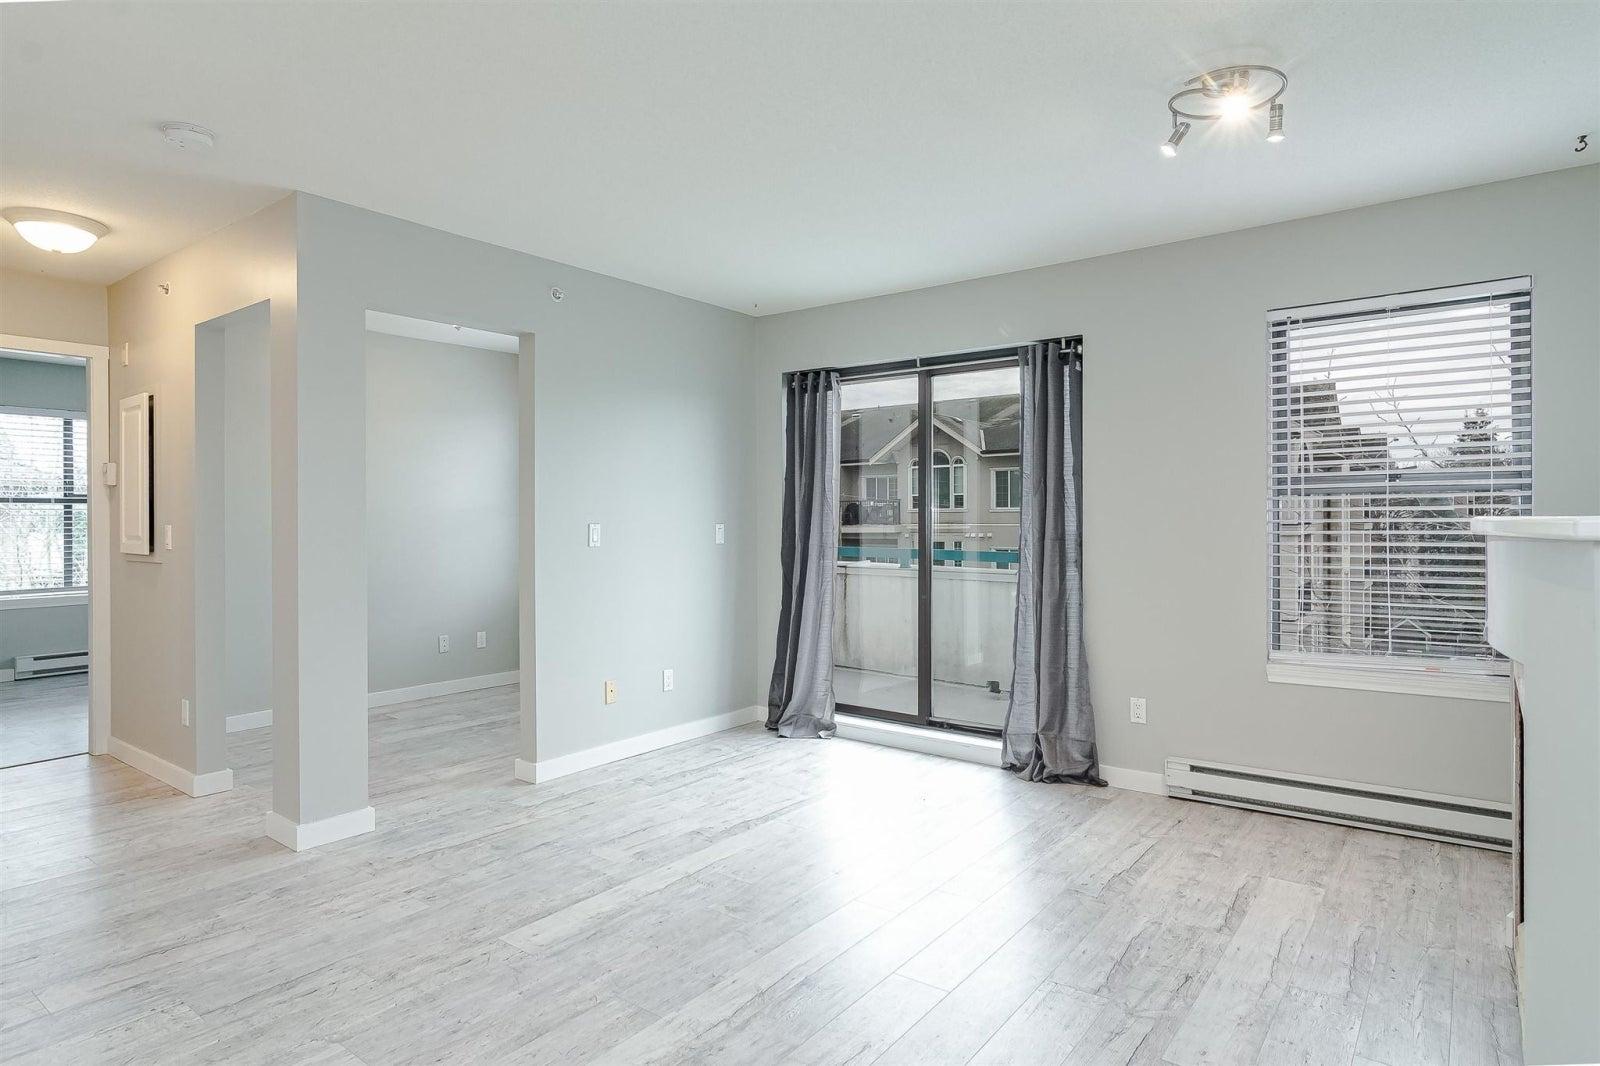 405 20268 54 AVENUE - Langley City Apartment/Condo for sale, 2 Bedrooms (R2604183) #10